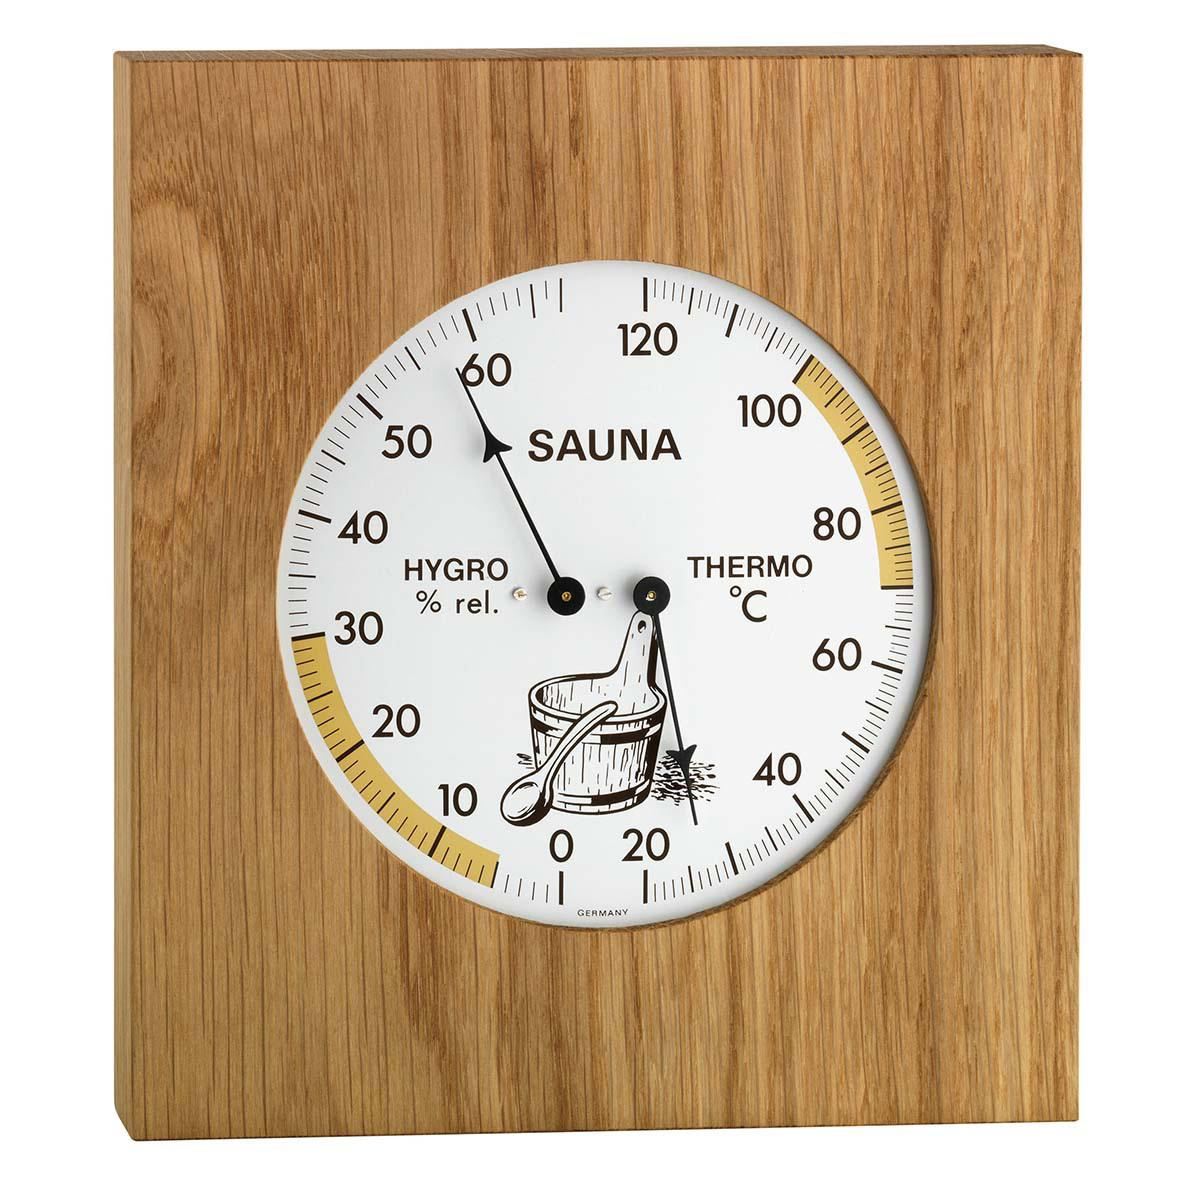 Sauna Kombinace (Teploměr, Vlhkoměr) - TFA 40.1051.01